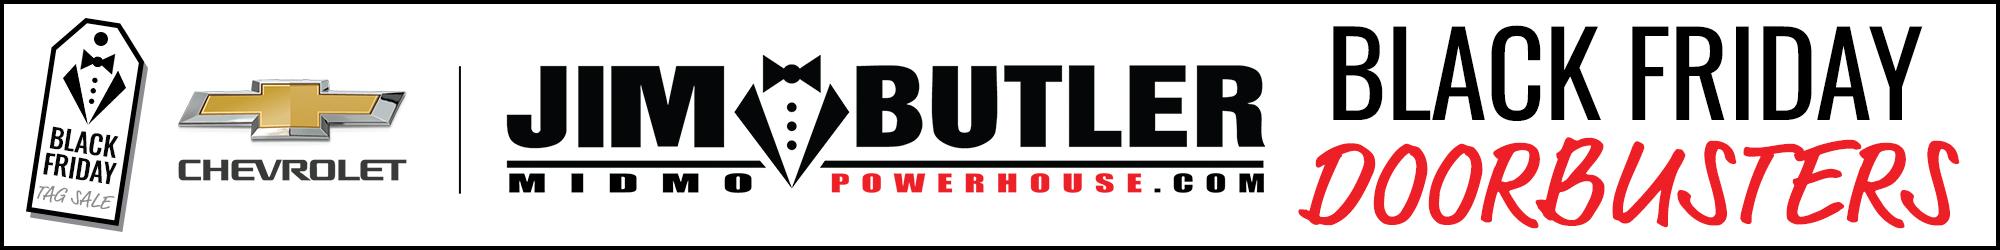 Mid Mo Powerhouse Doorbusters